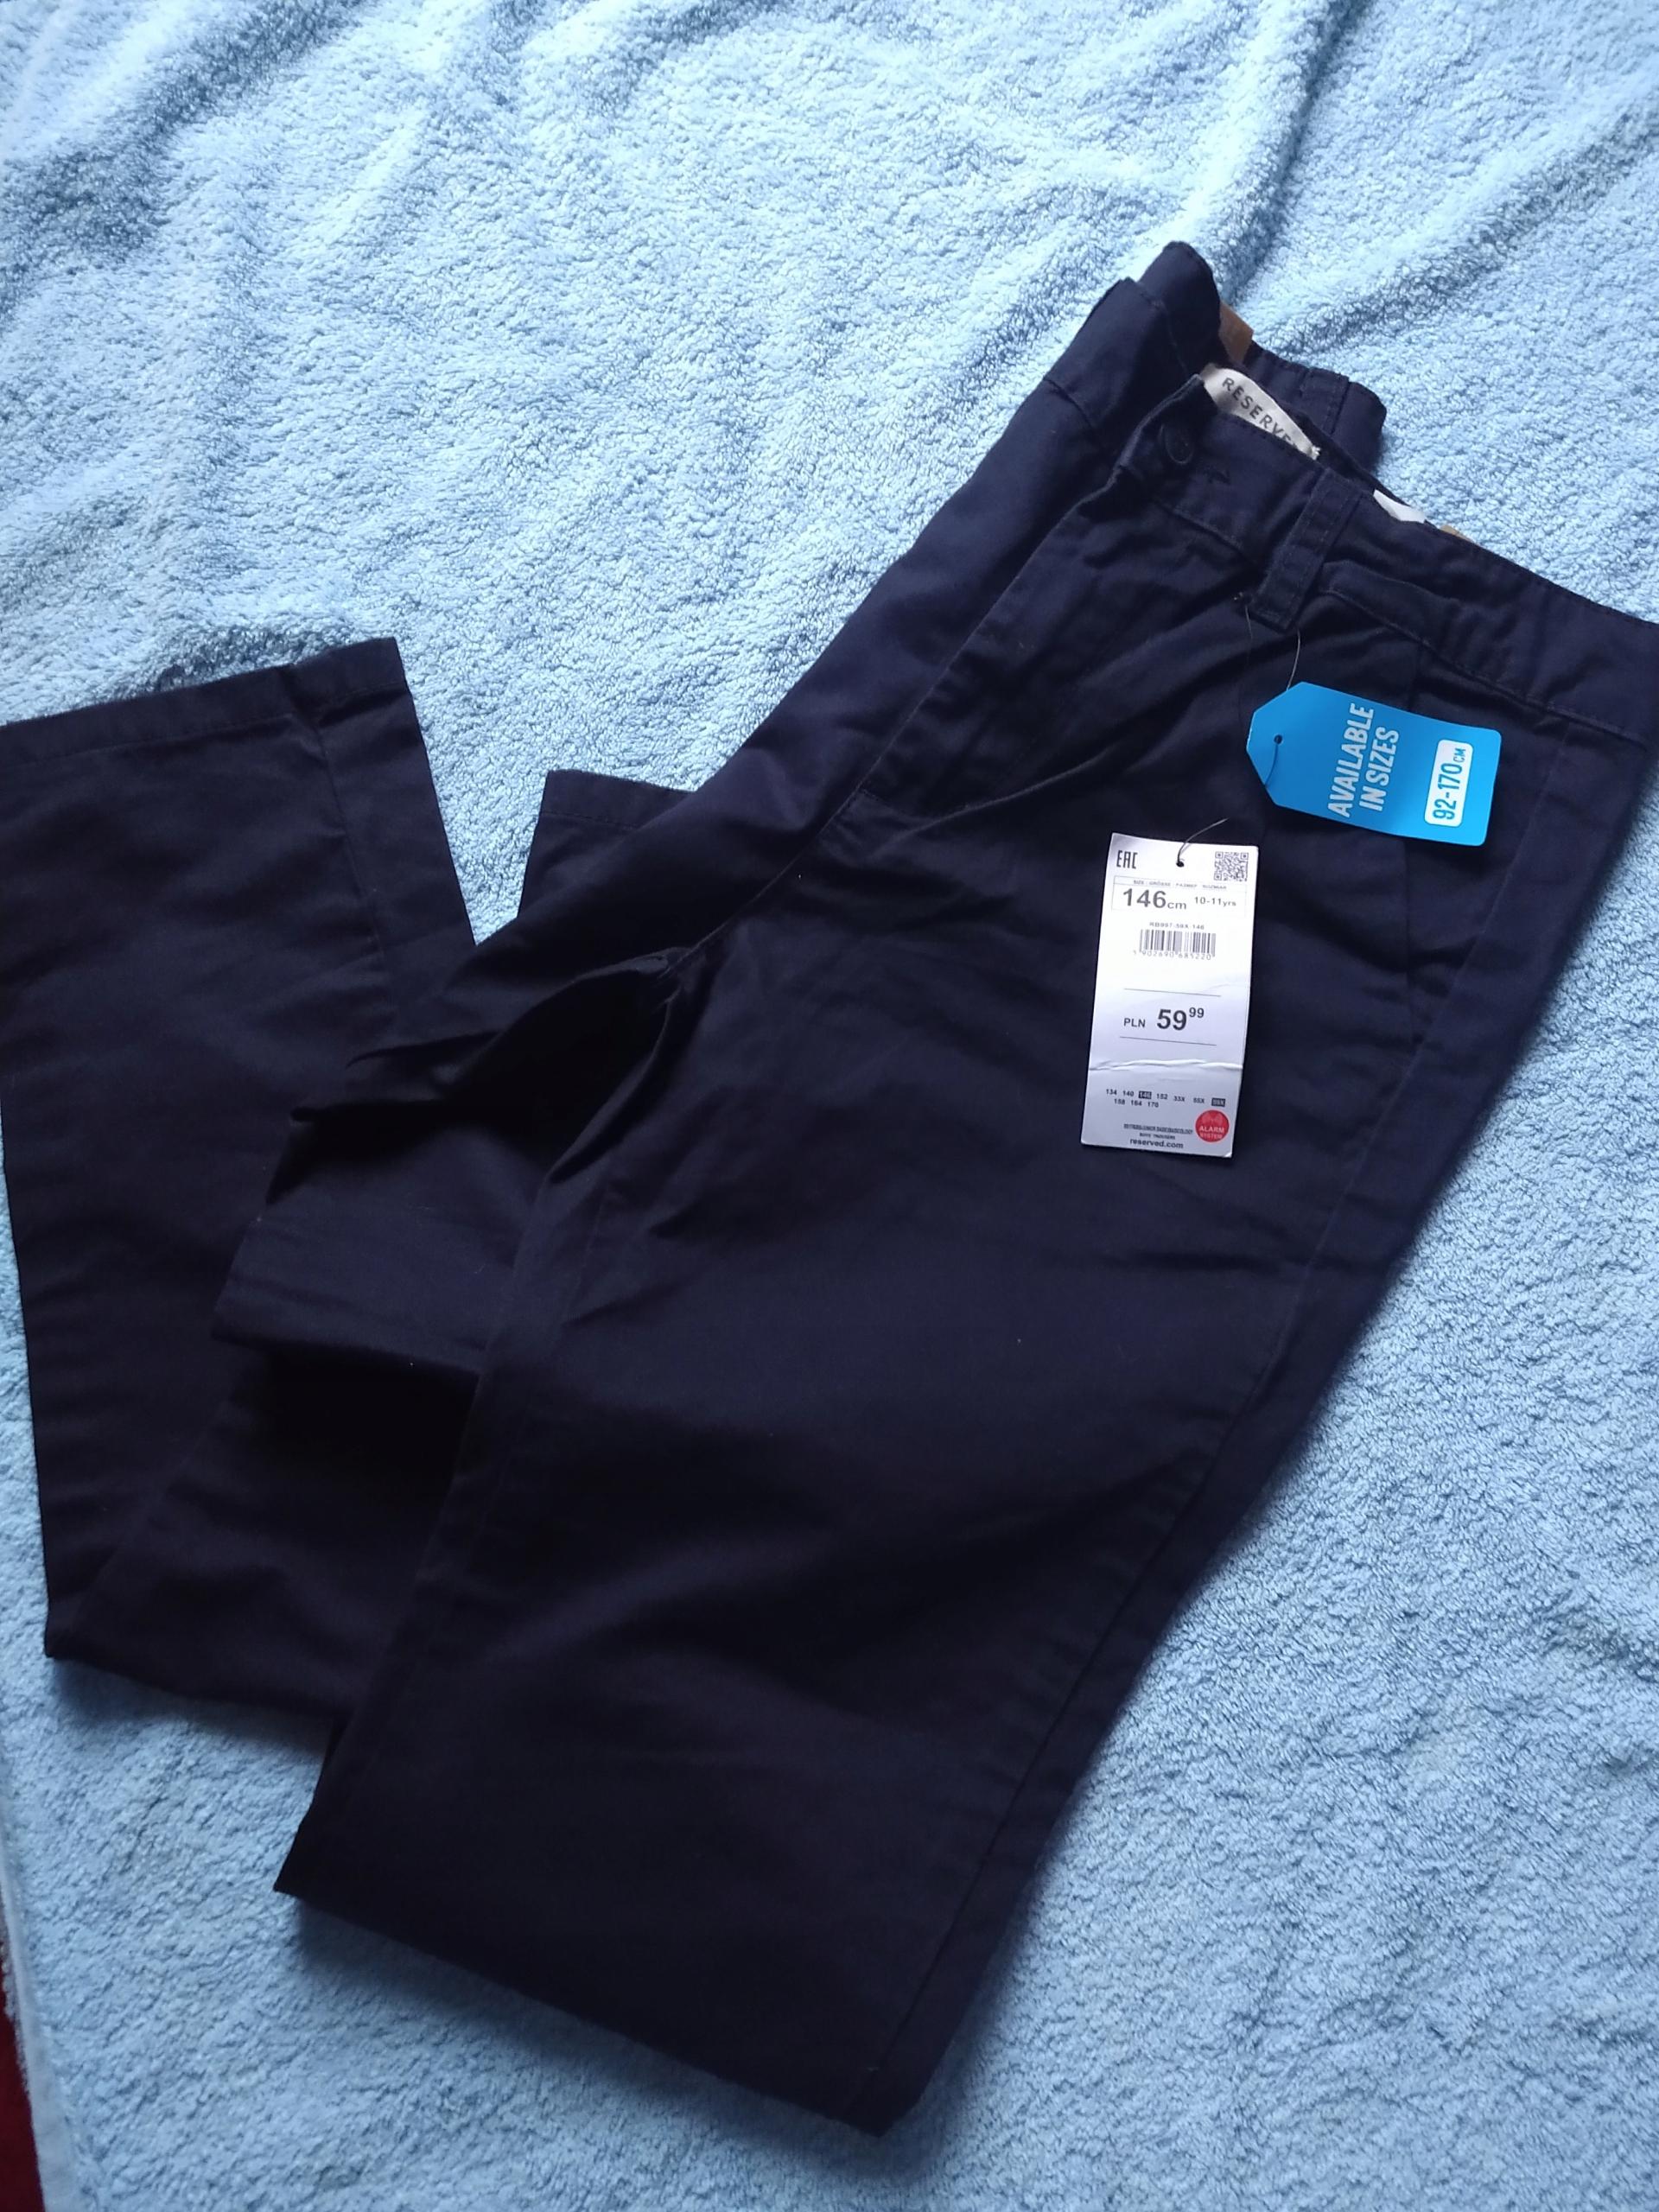 NOWE spodnie RESERVED r. 146 z metką